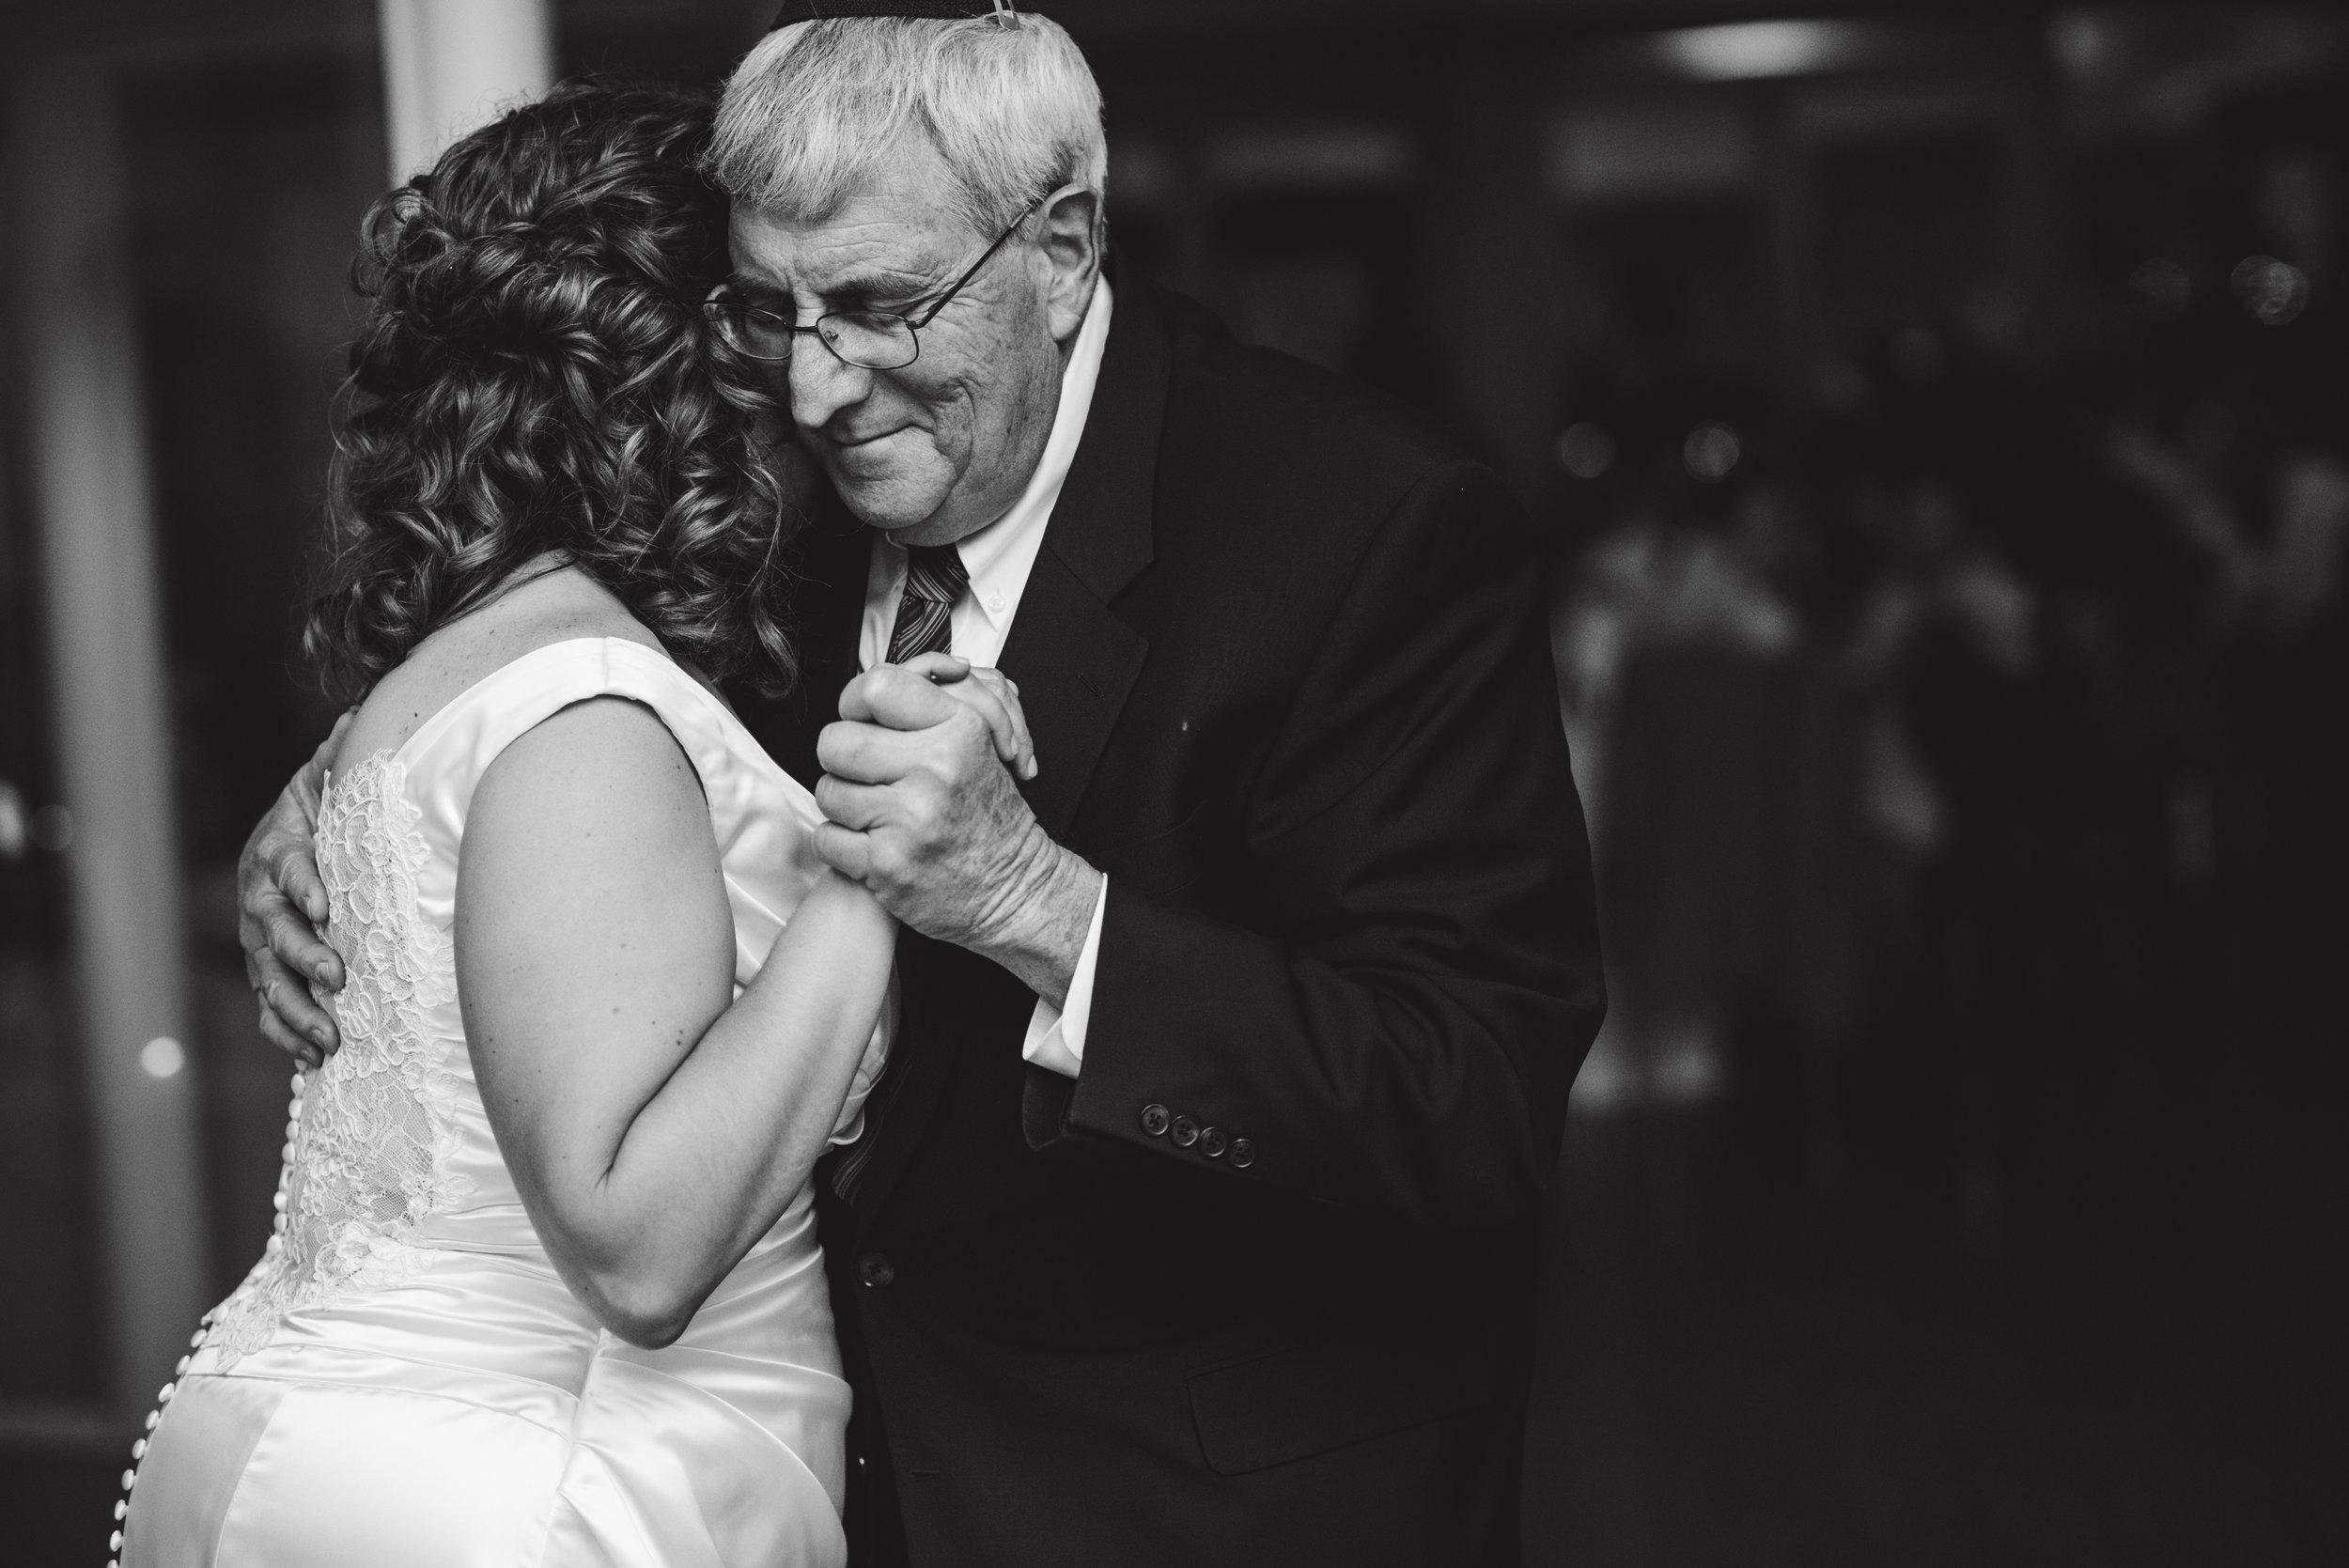 LIZA & JON - BATTERY PARK WEDDING - NYC INTIMATE WEDDING PHOTOGRAPHER - CHI-CHI AGBIM-808.jpg